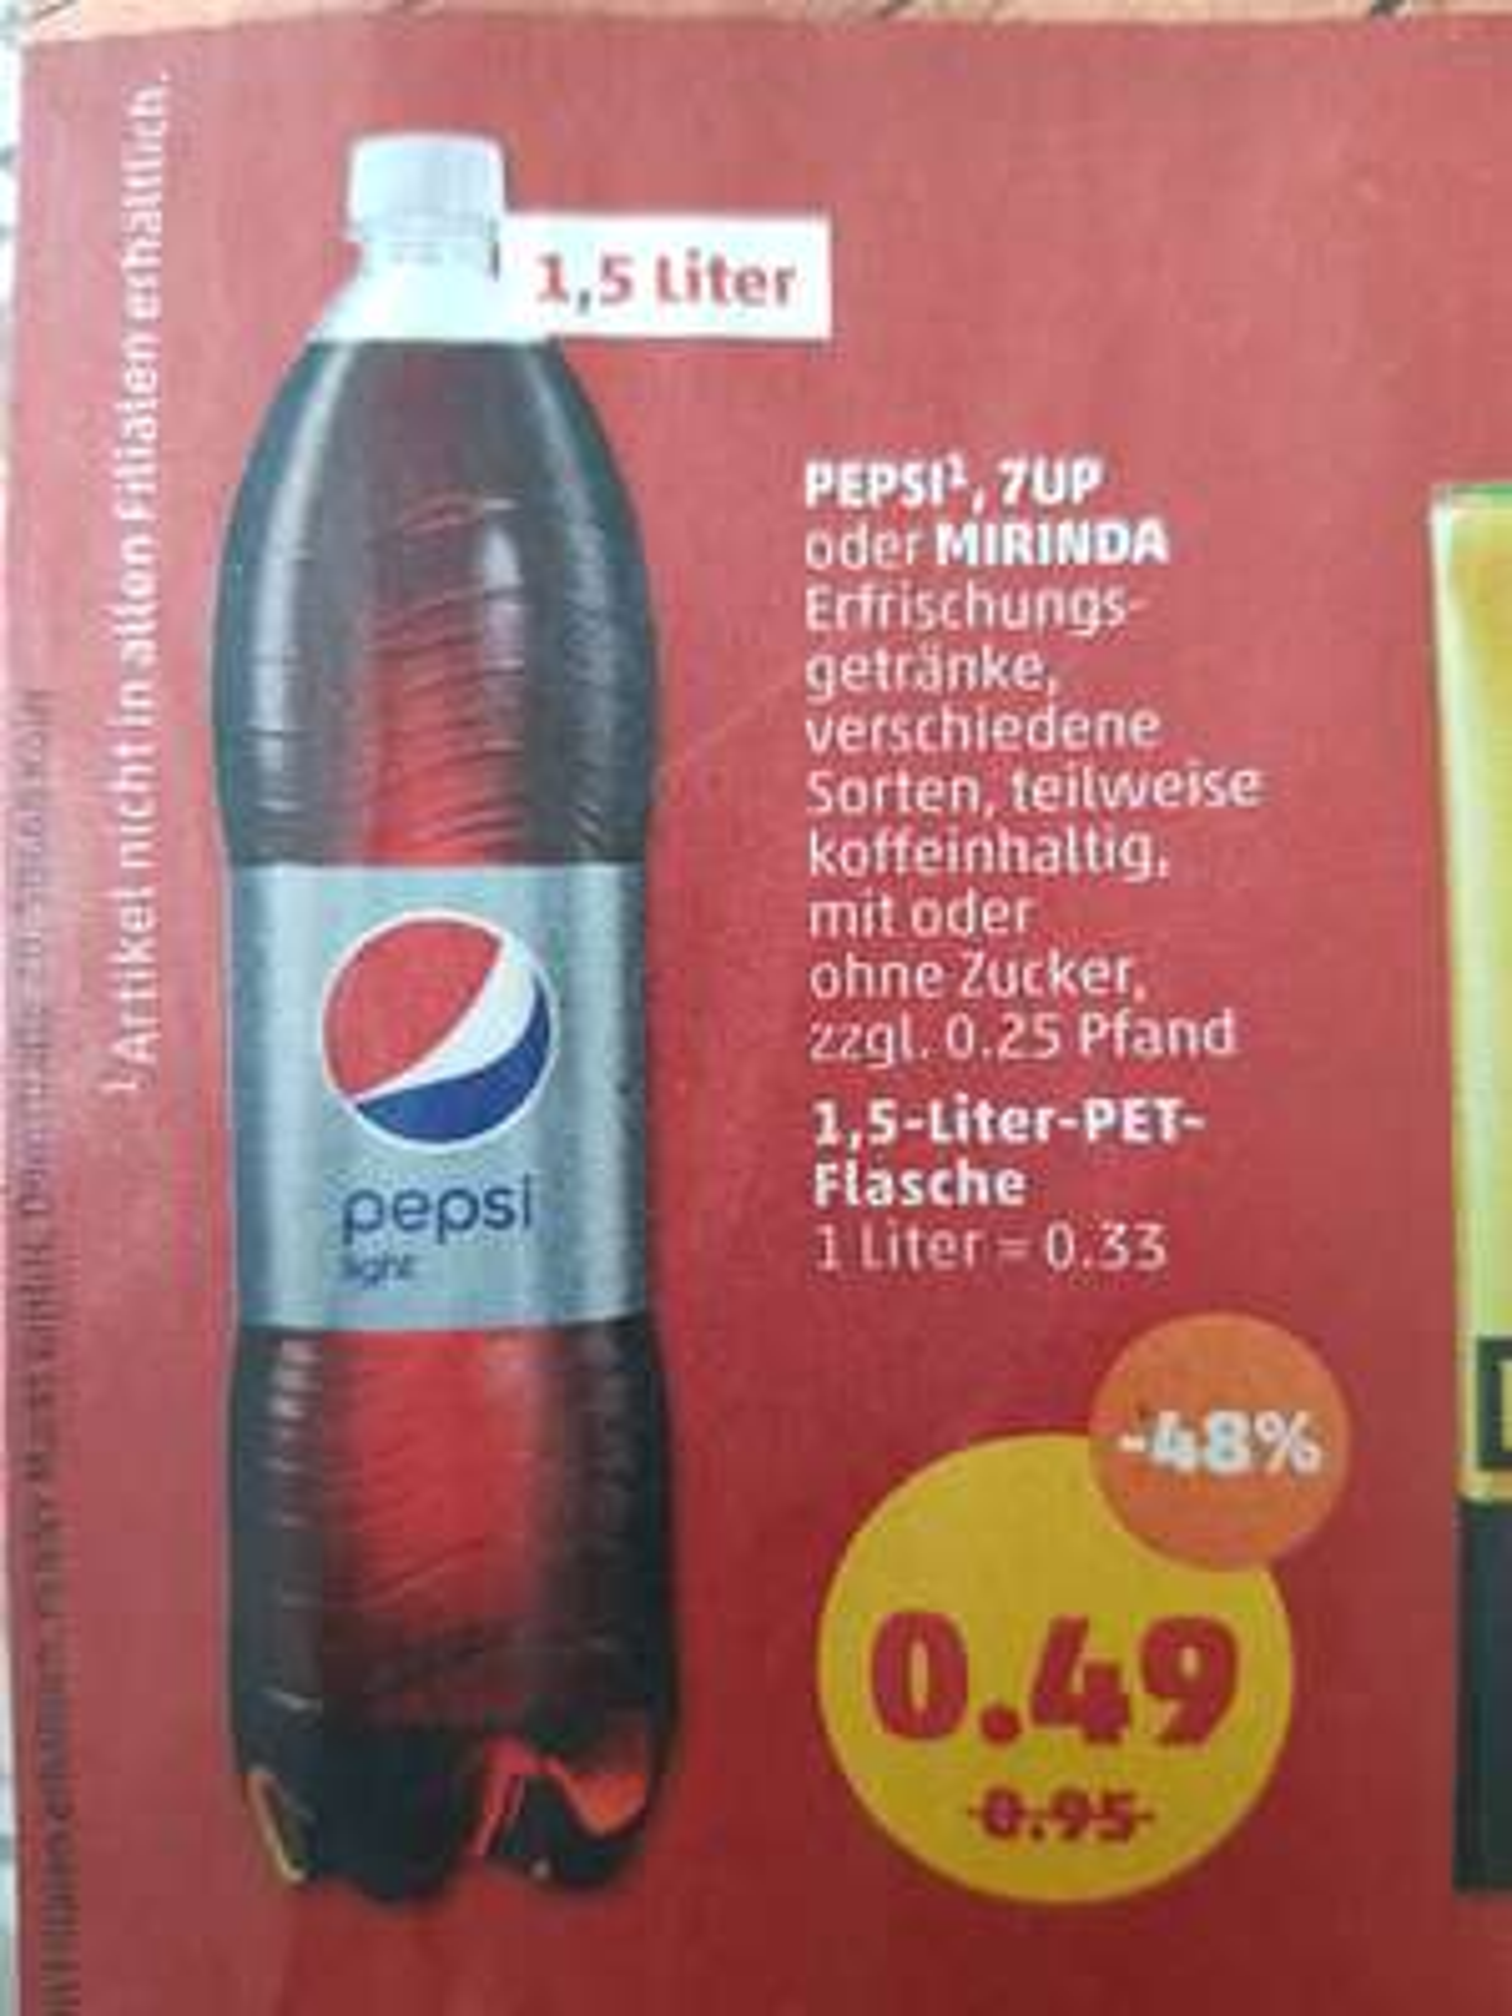 Ab 06.08 @ Penny Pepsi (alle Sorten)/7UP/Mirinda 1.5L für 0.49€